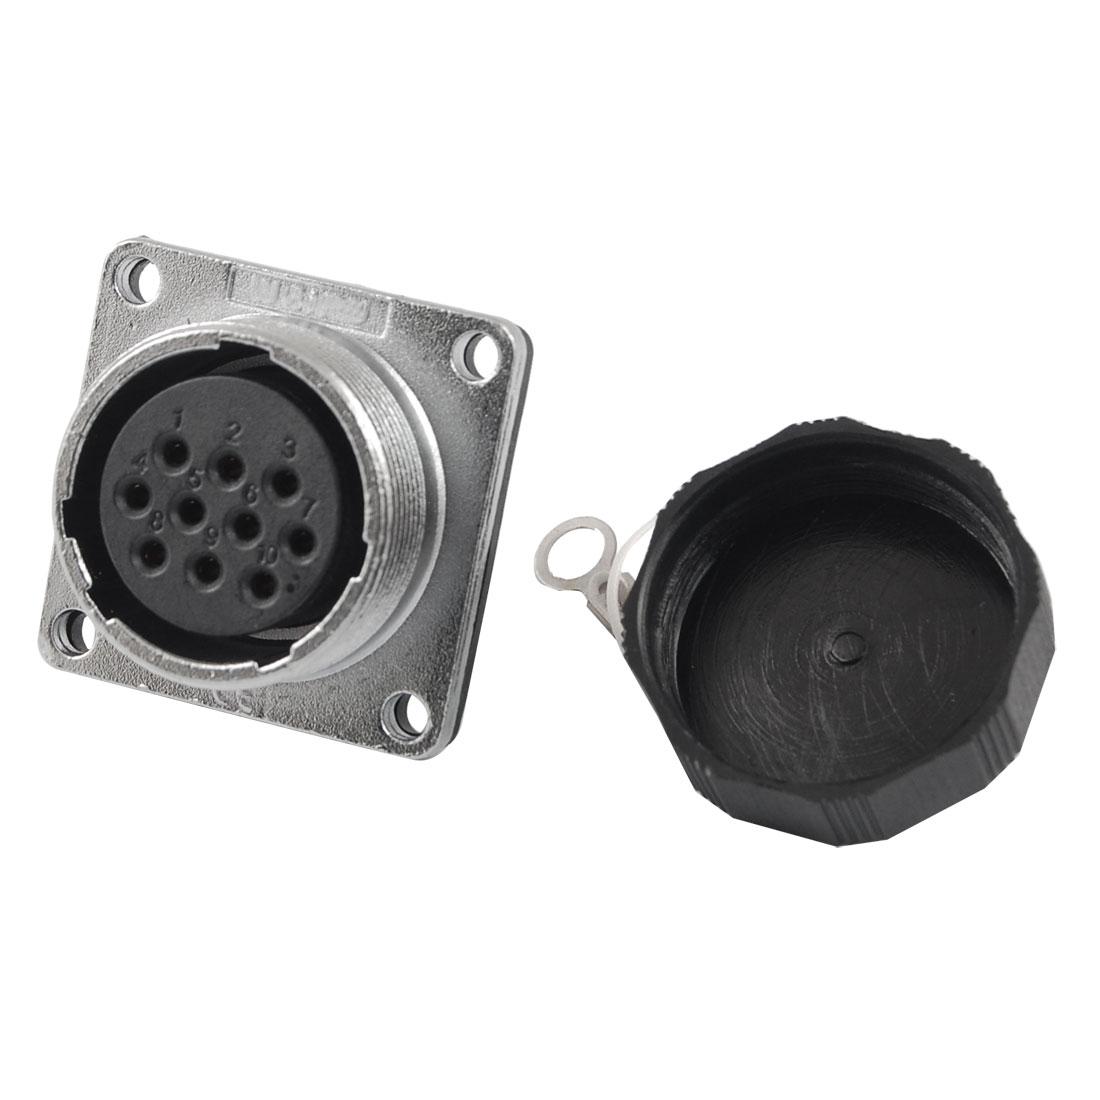 24mm Base 10 Pins Alumnium Shell Capped Aviation Connector Plug AC 500V 10A